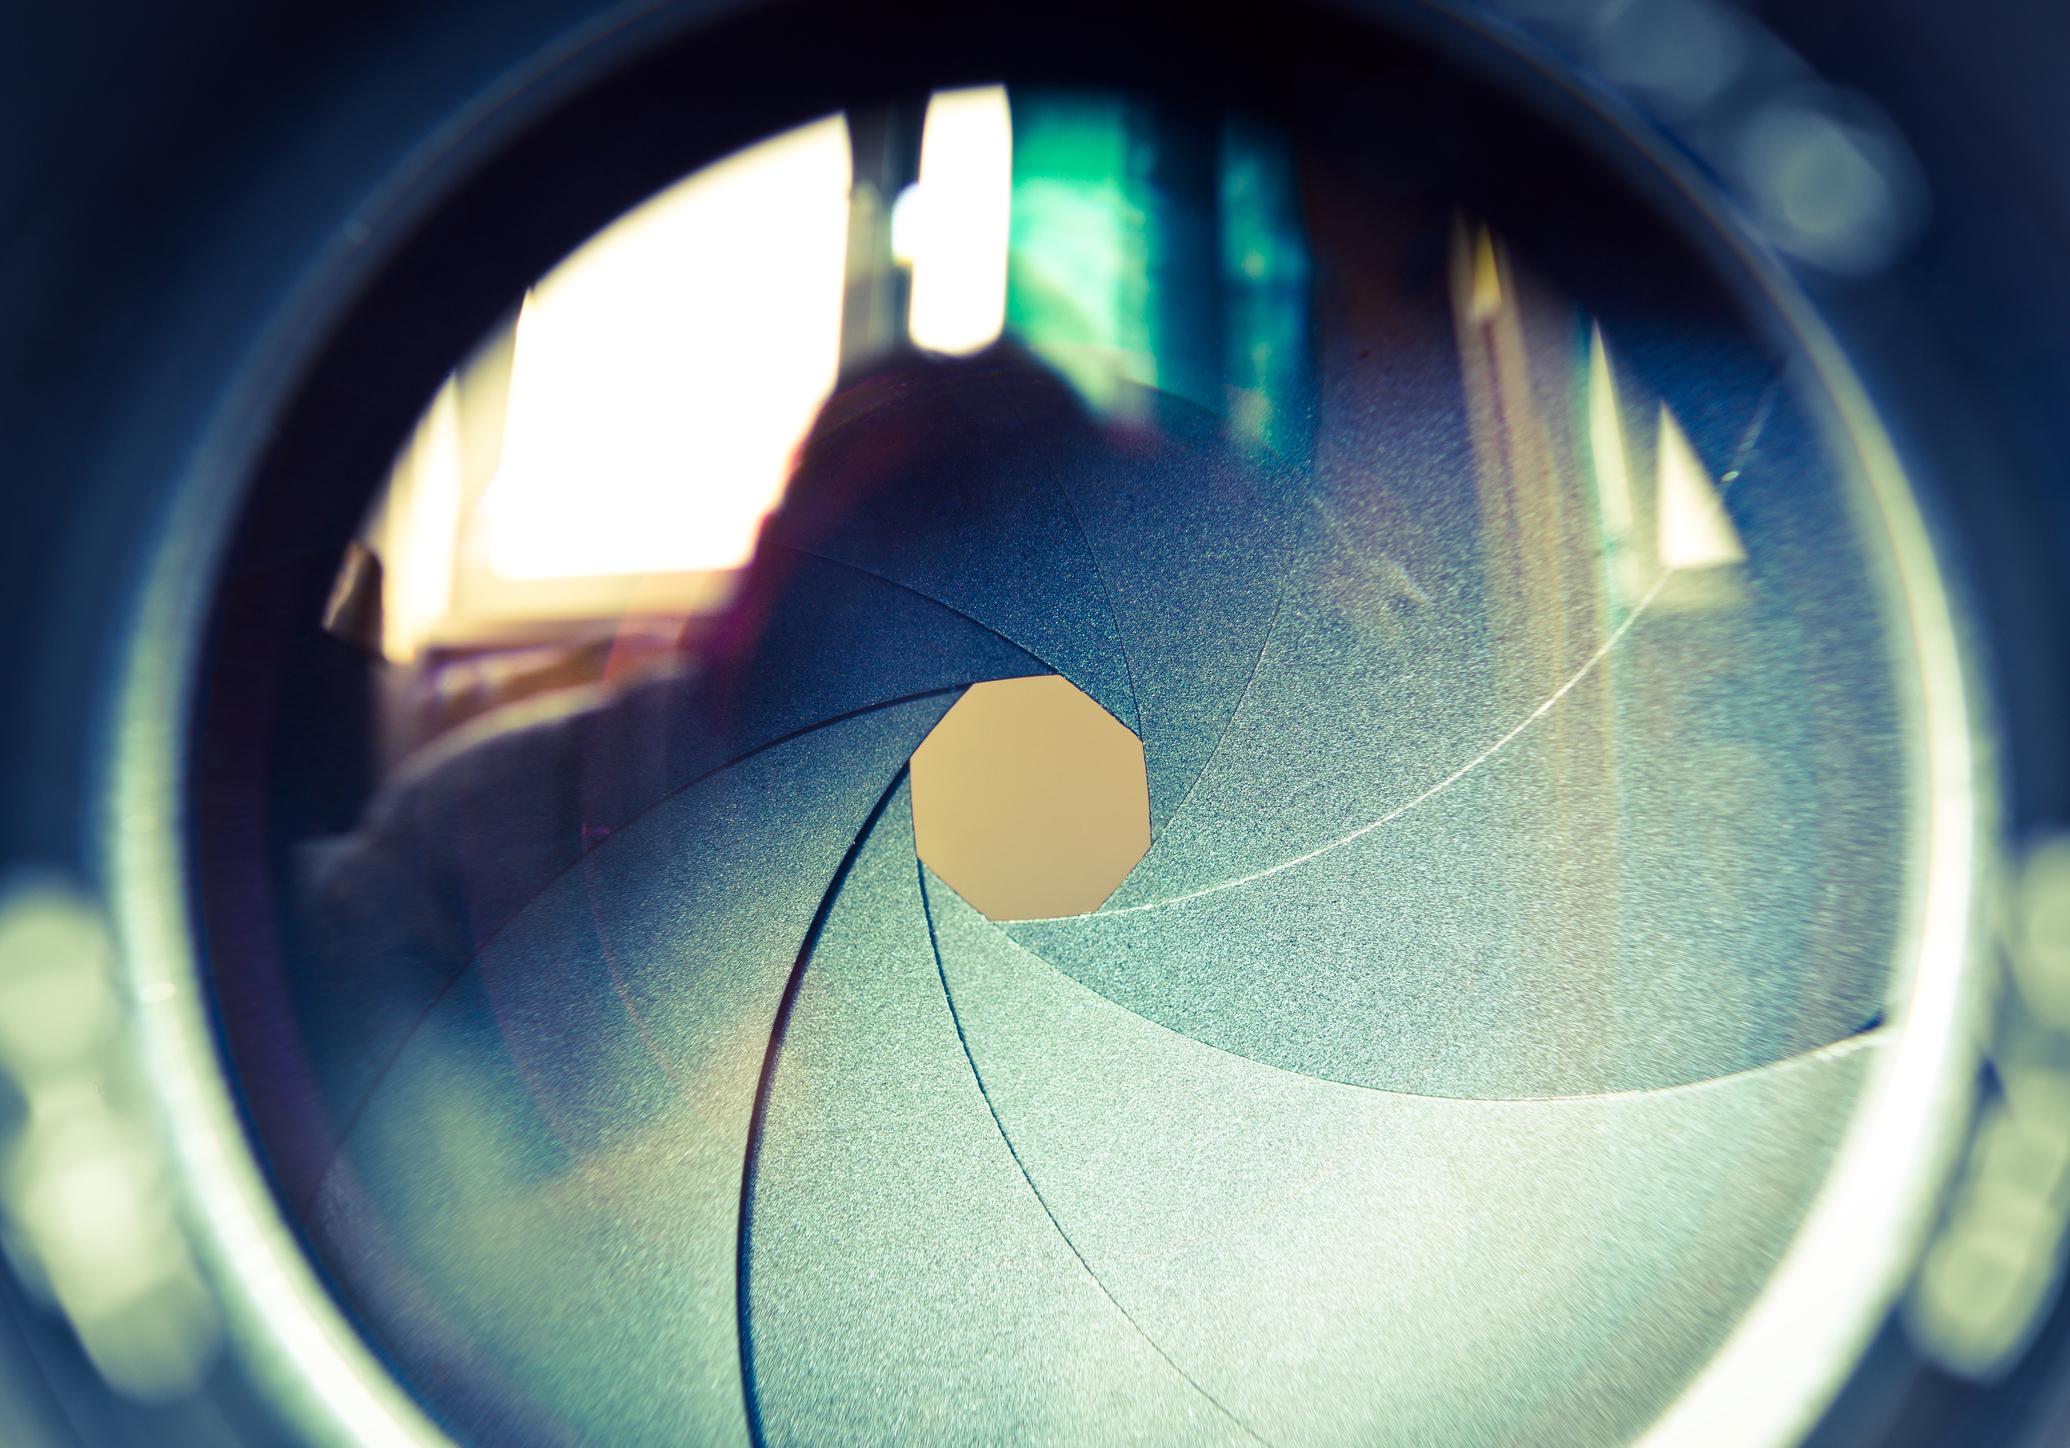 A closeup of a camera aperture opening.